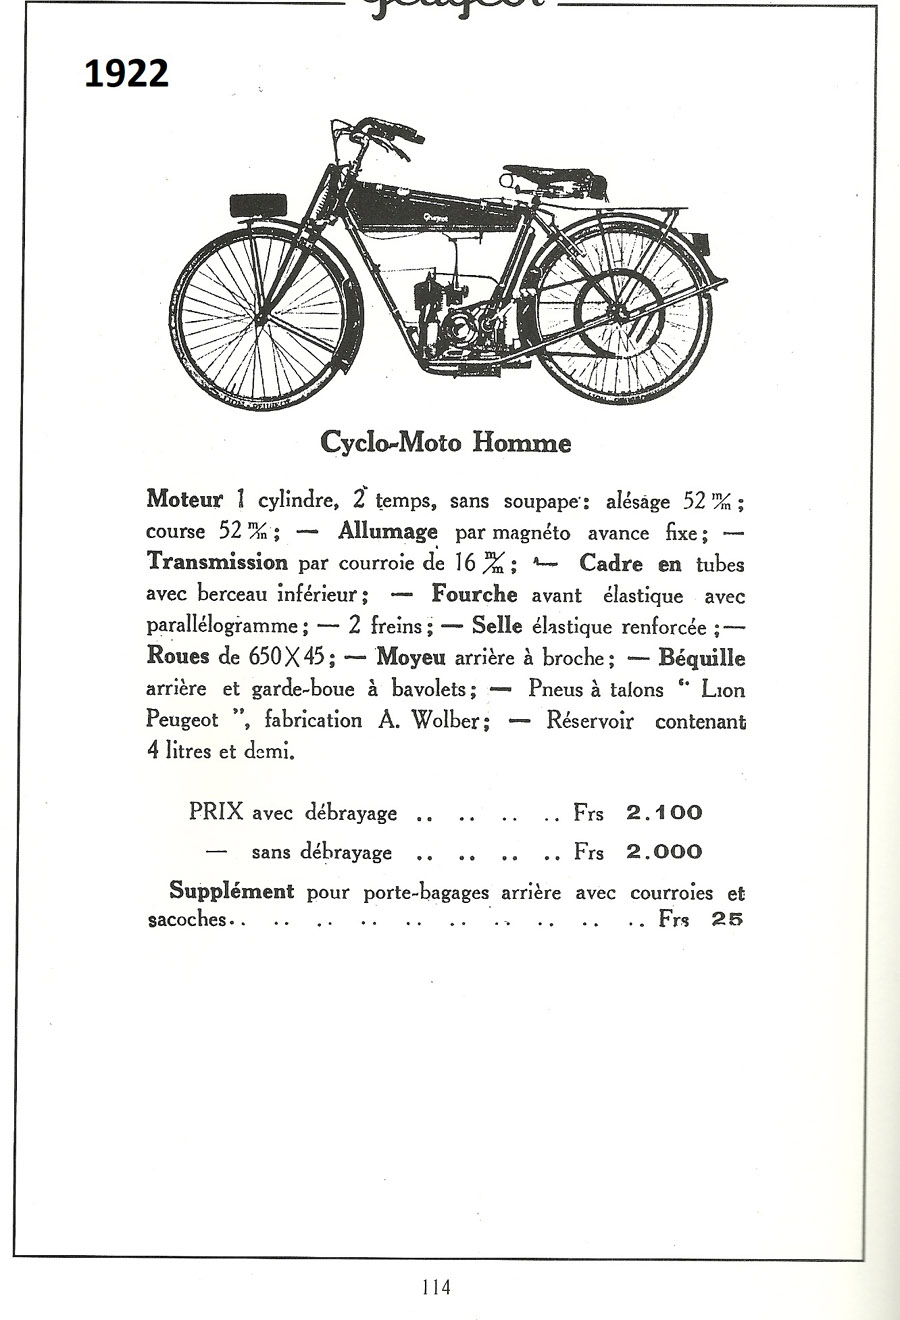 La Peugeot Cyclomoto de dom54 Numzor14